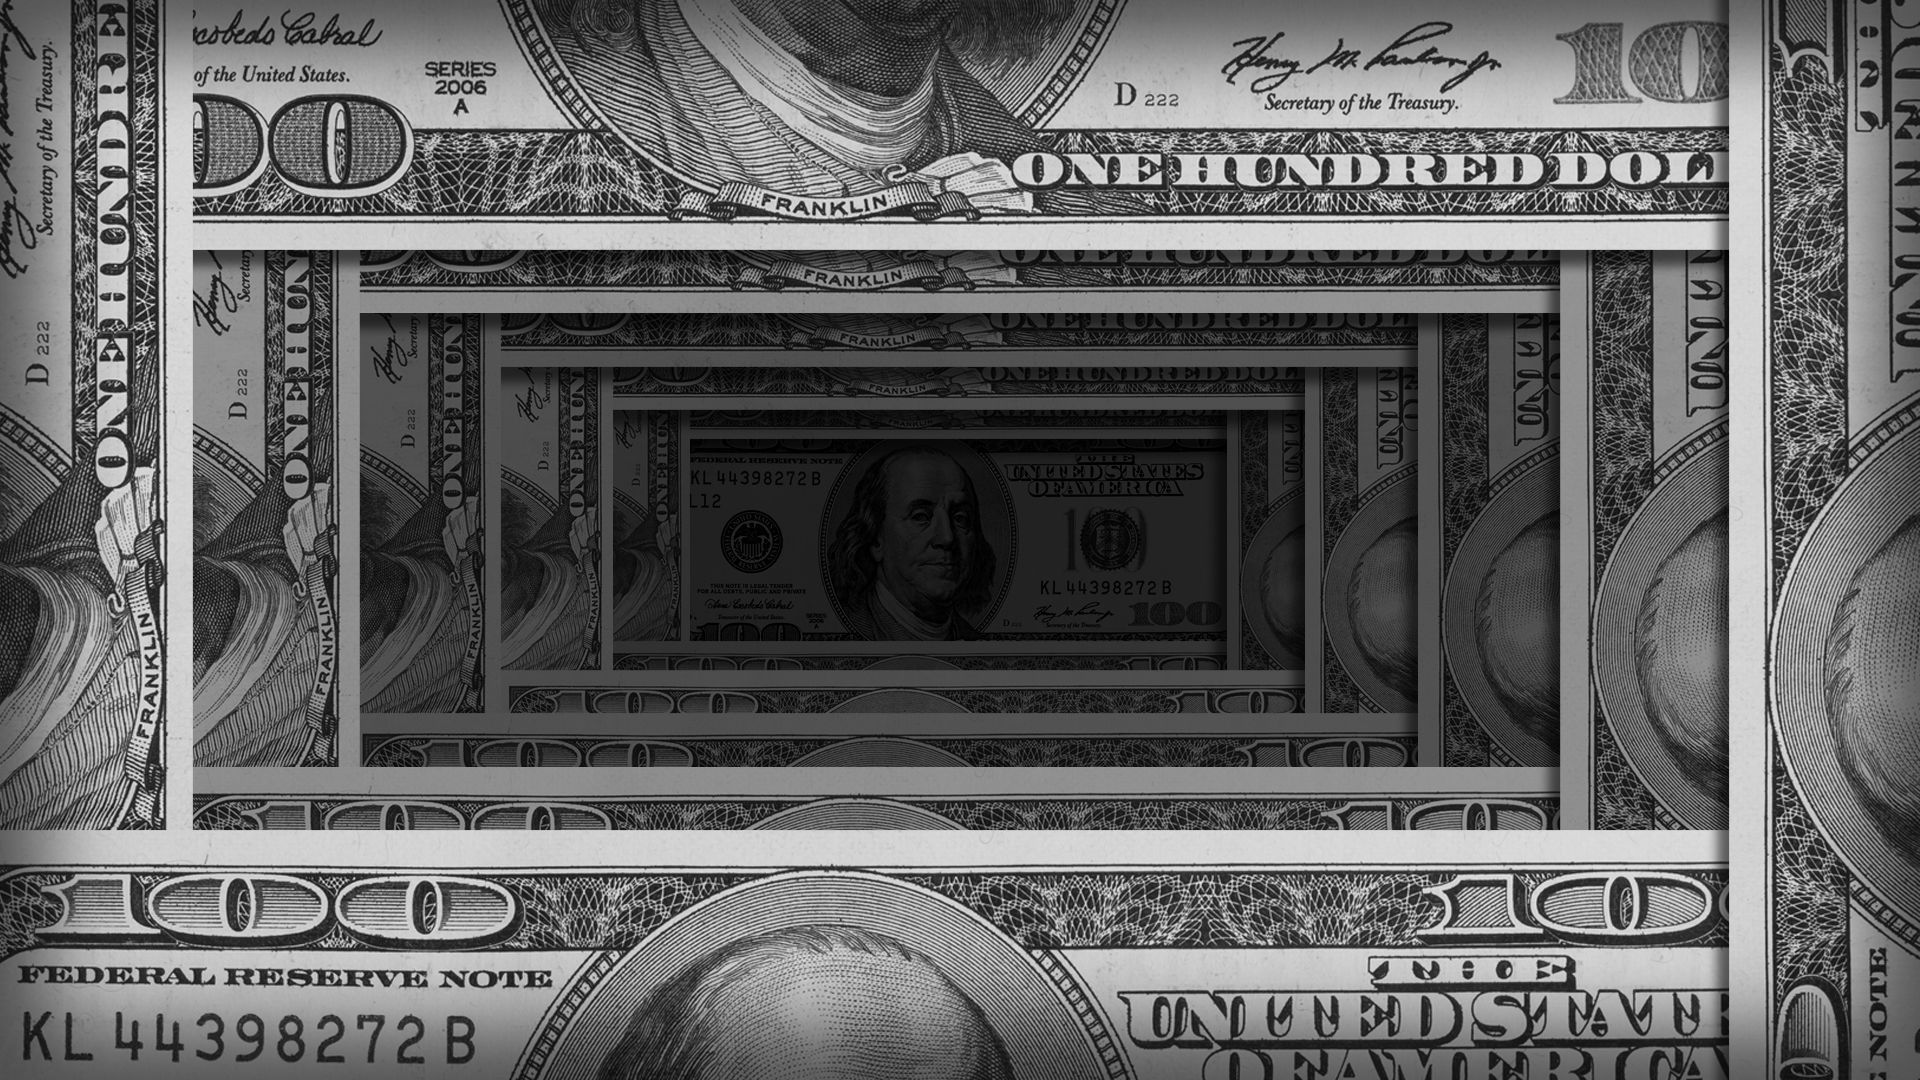 Illustration of stacks of hundred dollar bills receding into an ever-darker distance